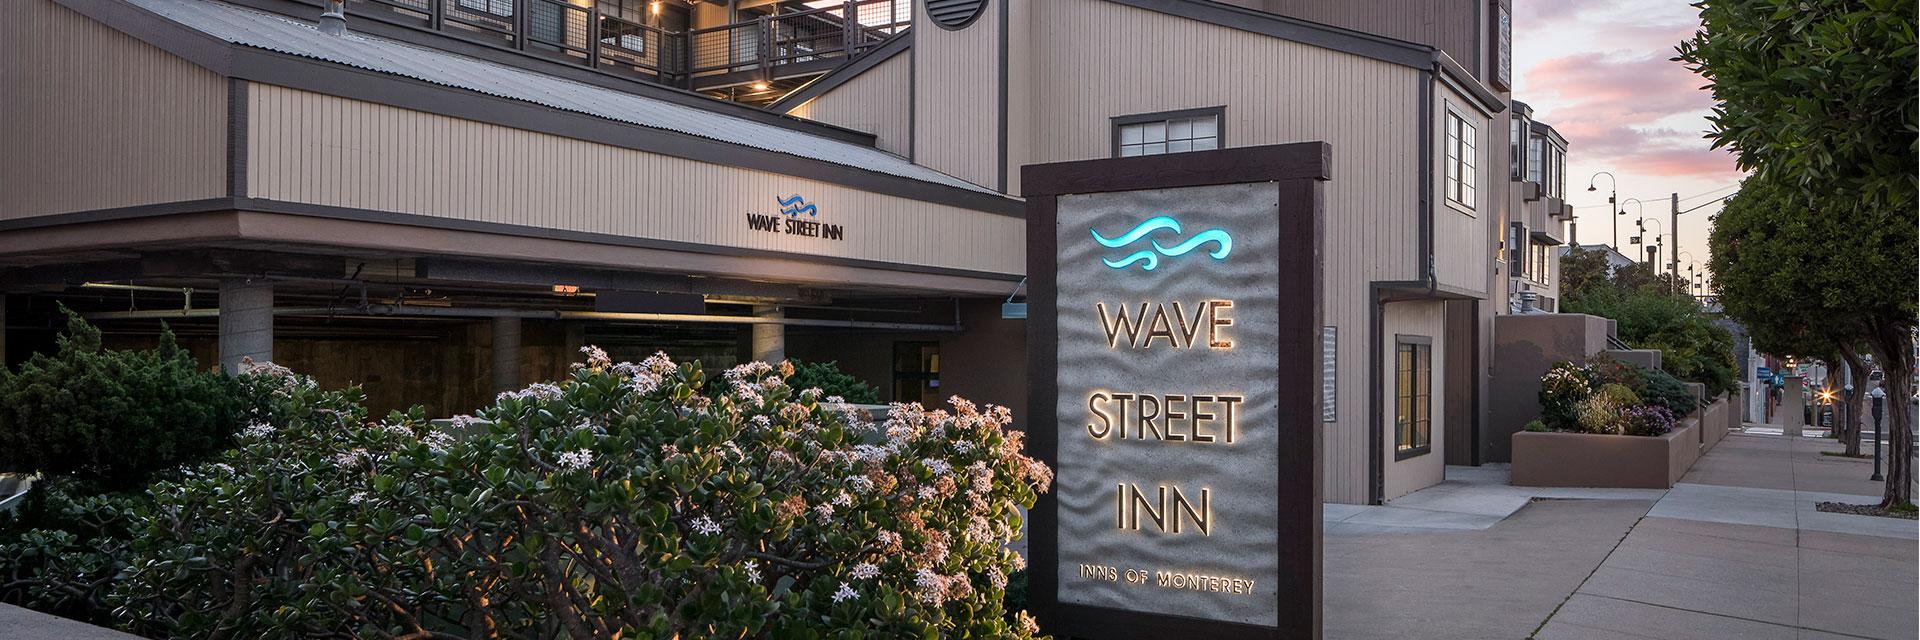 Innsider Cash Rewards Wave Street Inn